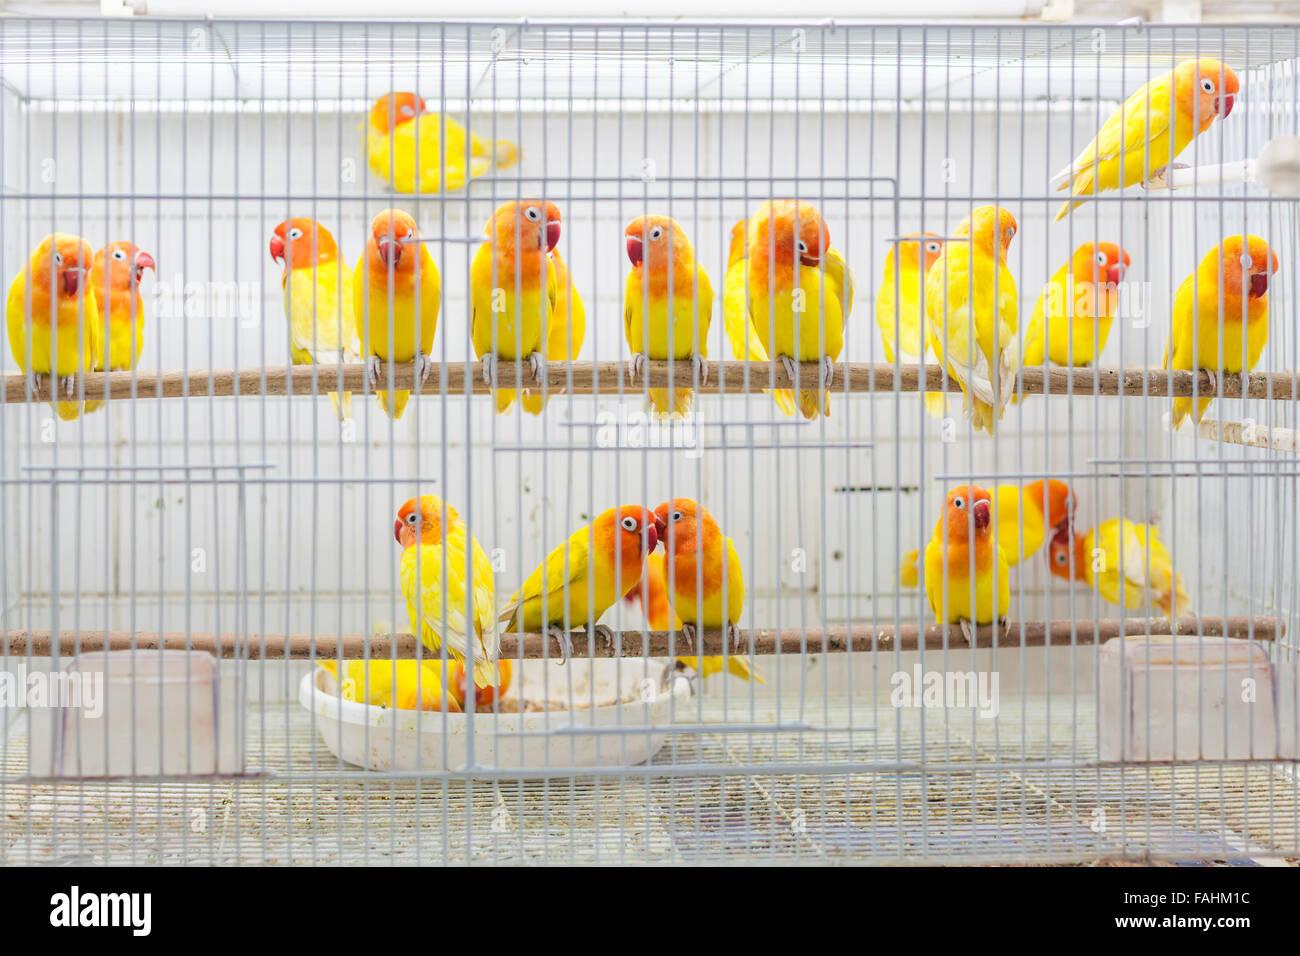 Vögel zu verkaufen im Souq Waqif, Doha Stockbild